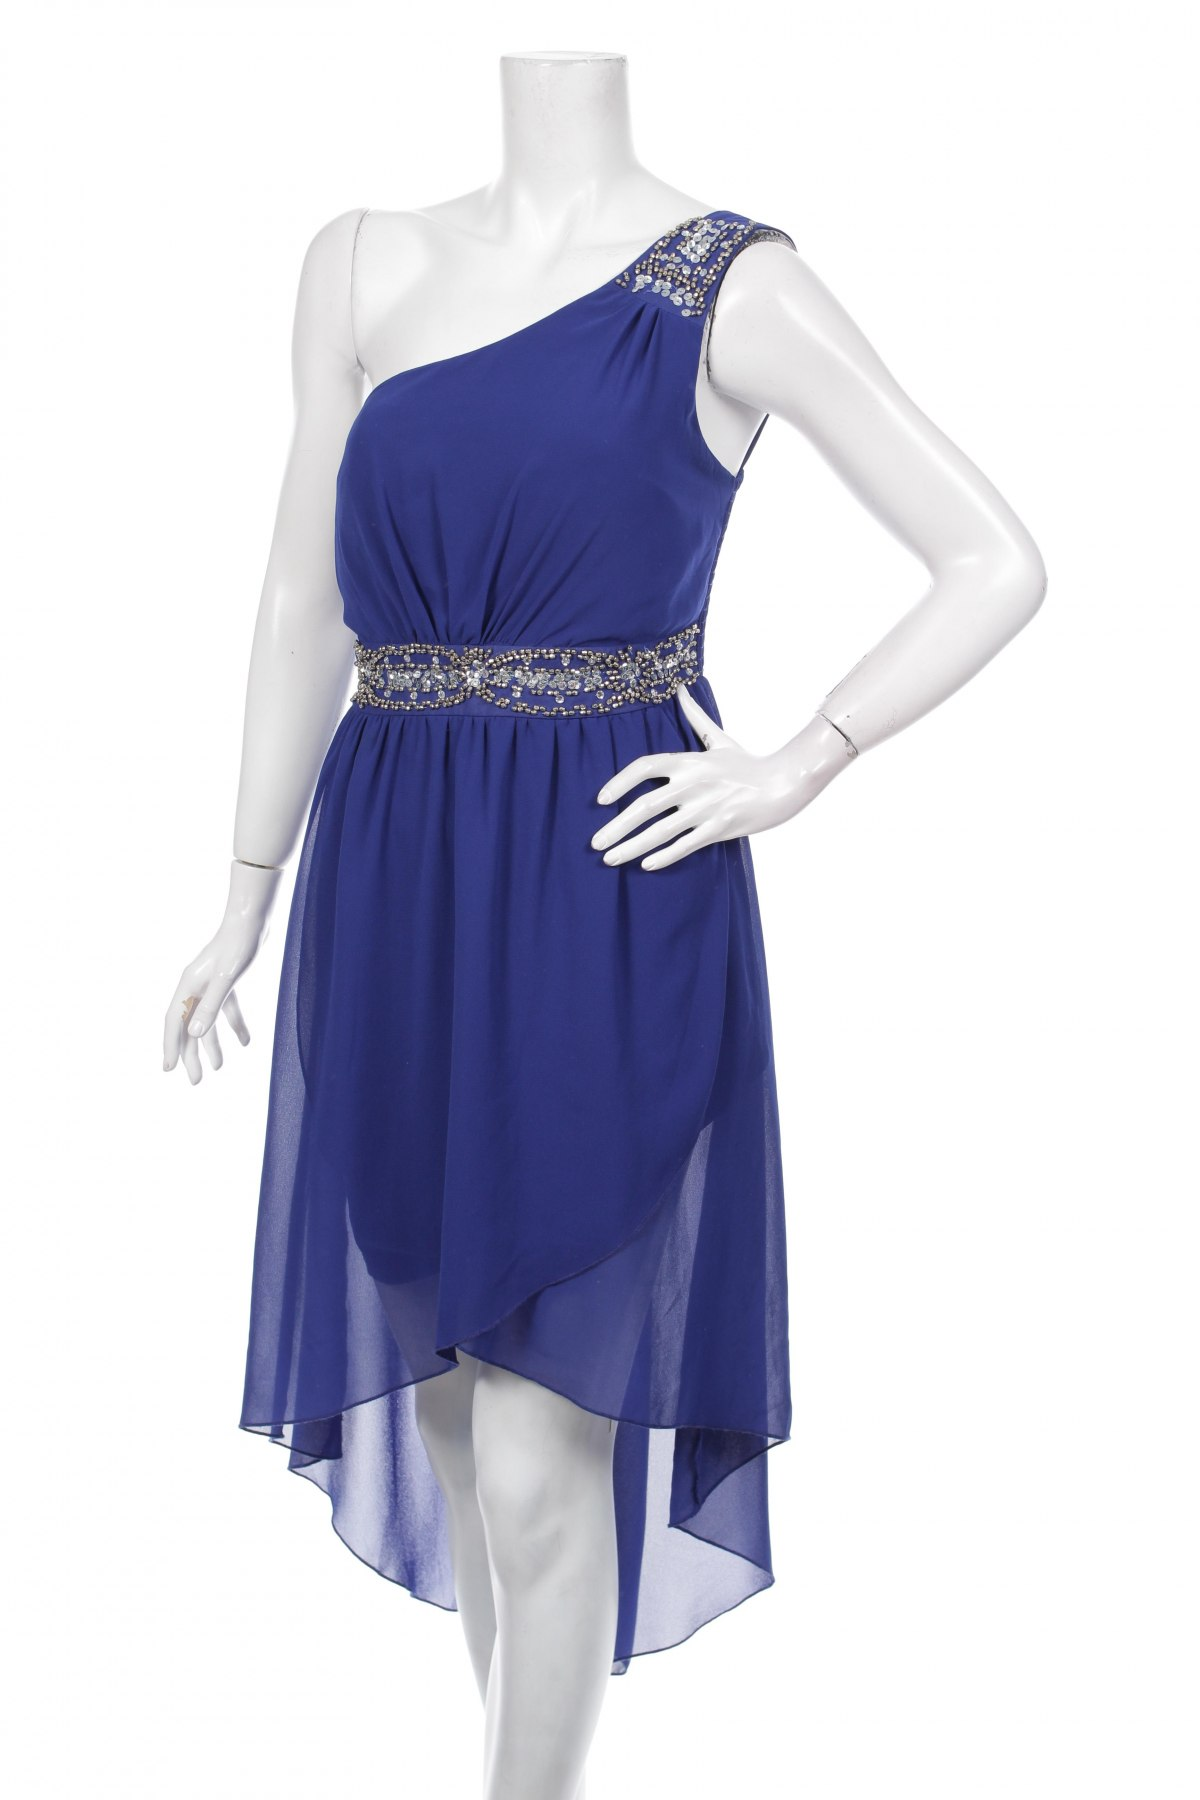 dbbc20d1a449 Φόρεμα Eva E Lola - σε συμφέρουσα τιμή στο Remix -  5412279